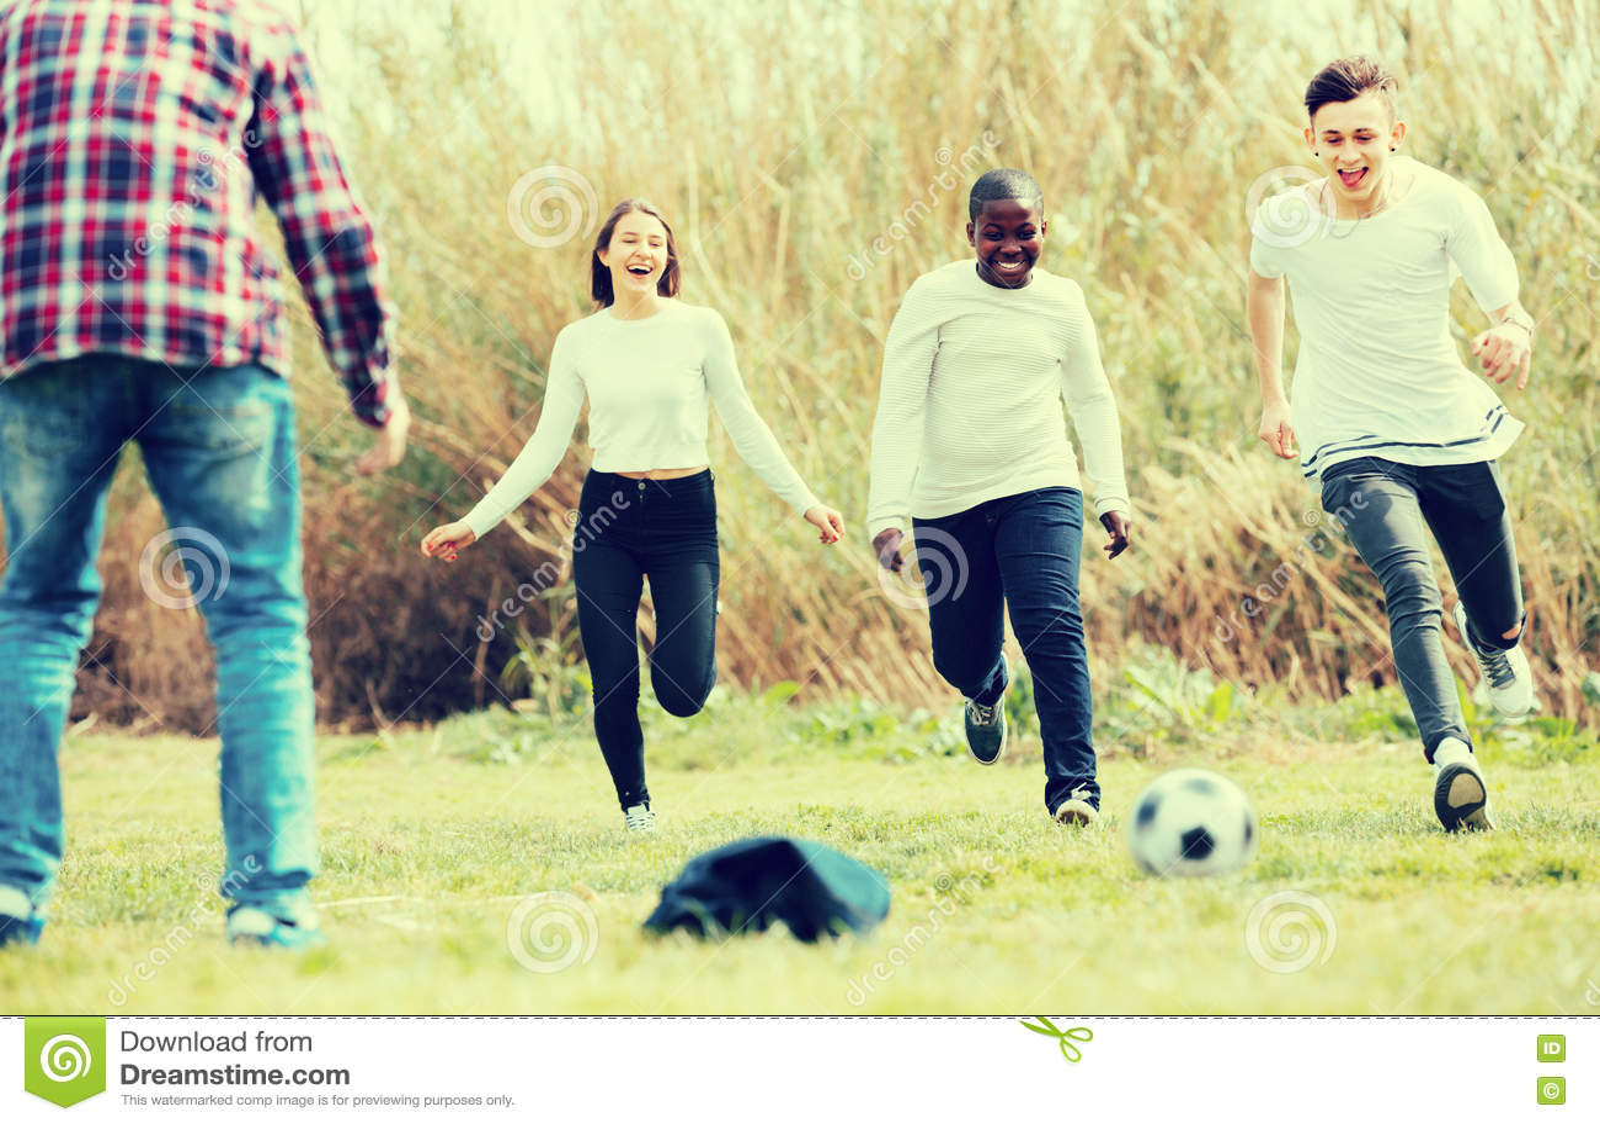 Teenage Friends Playing Football Stock Photo - Image: 71619919